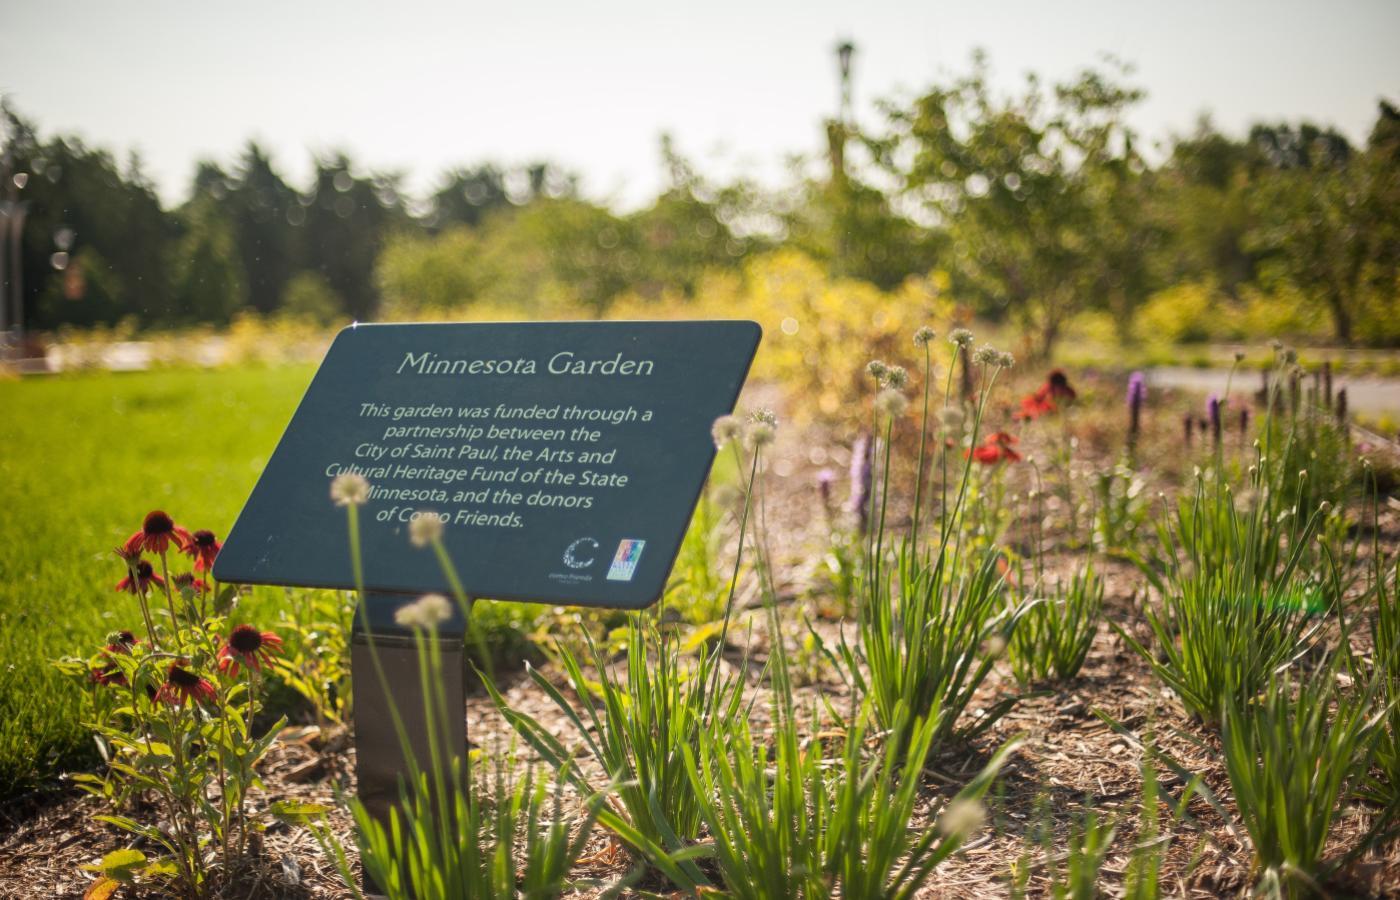 Minnesota Garden at Como Park - 5